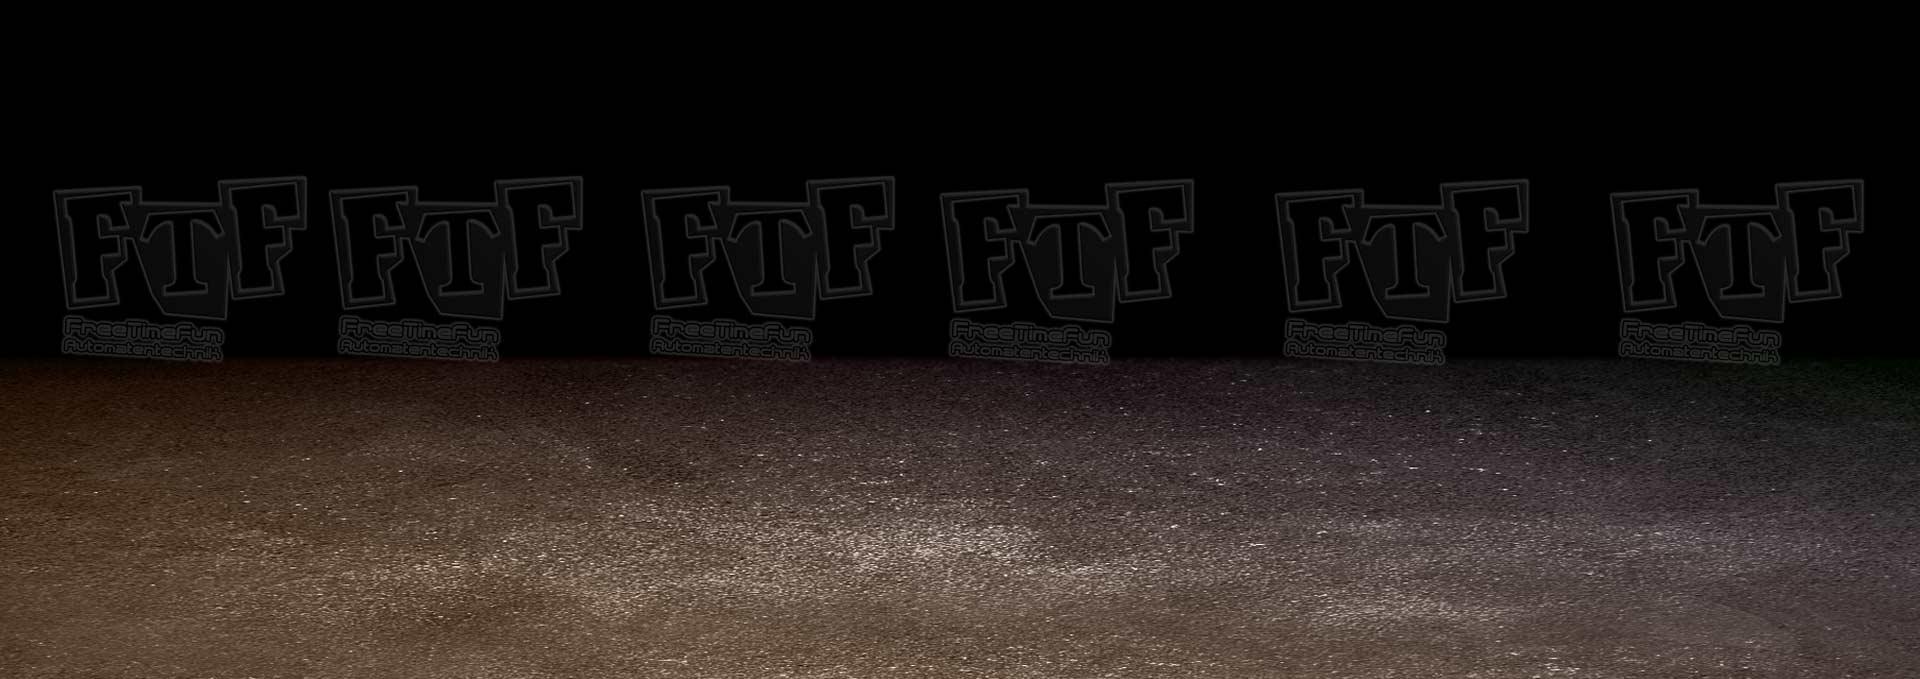 ftf_wels_slider_automaten_bg